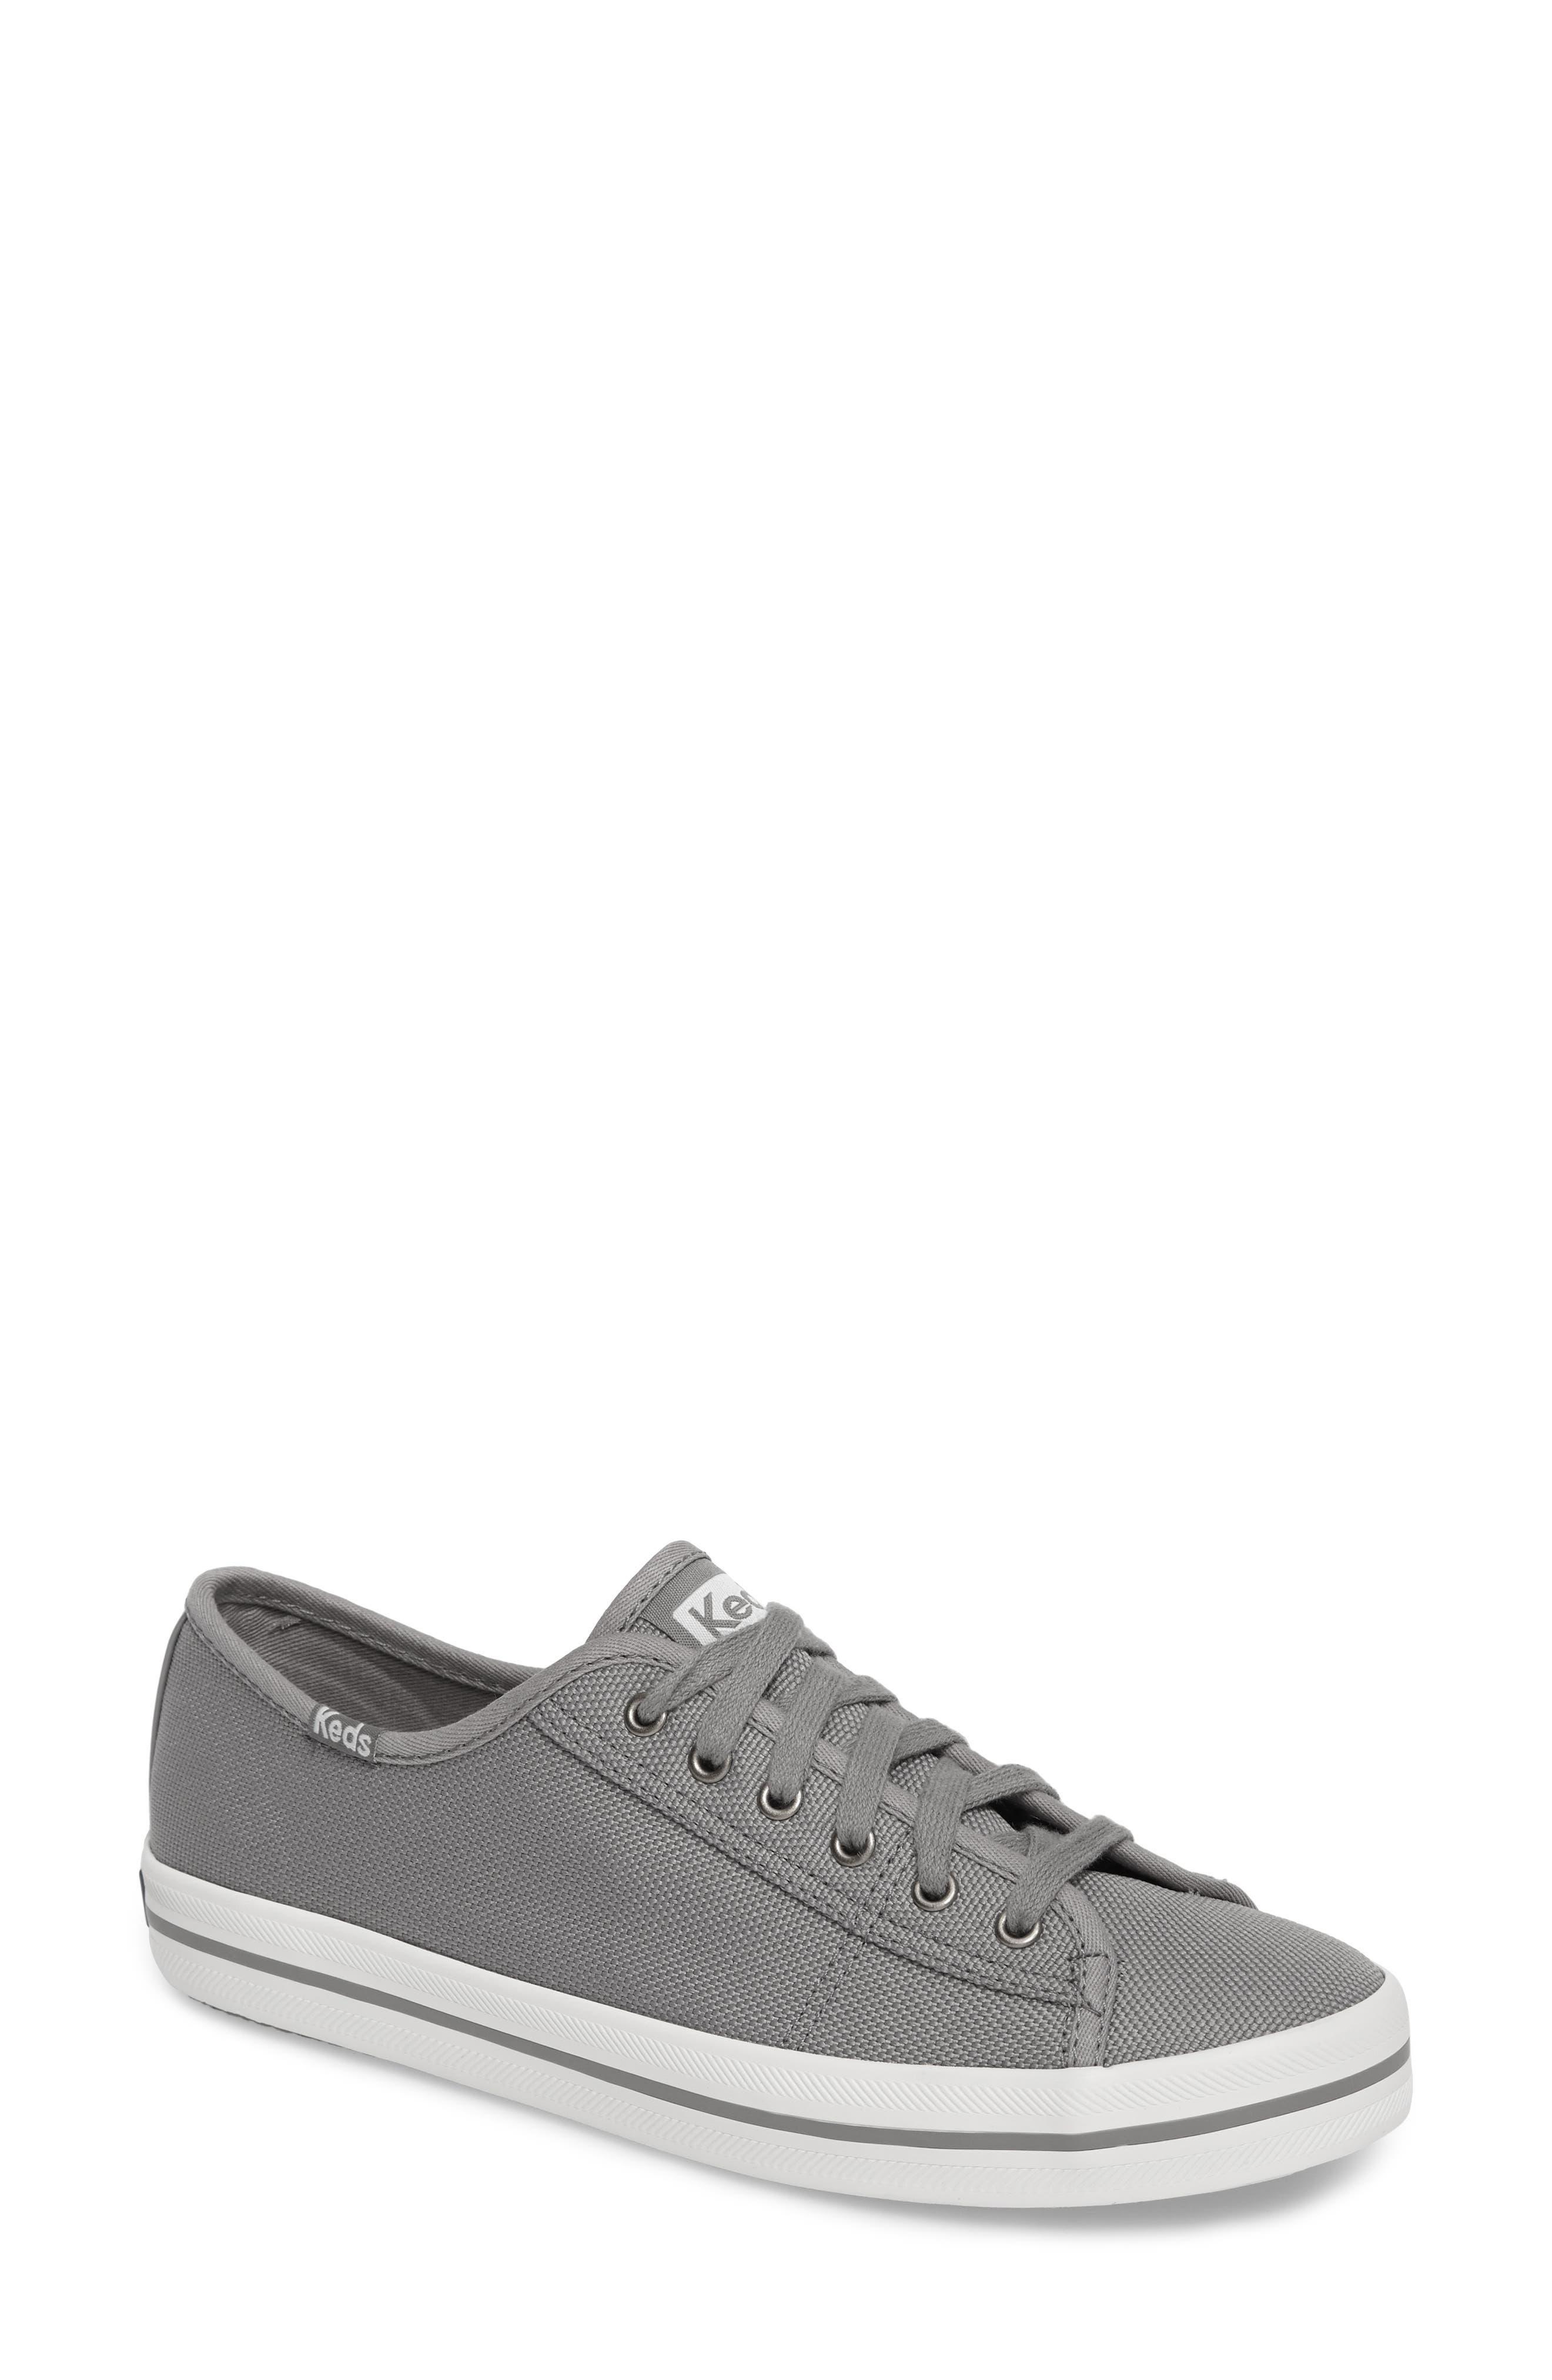 KEDS<SUP>®</SUP> Kickstart Sneaker